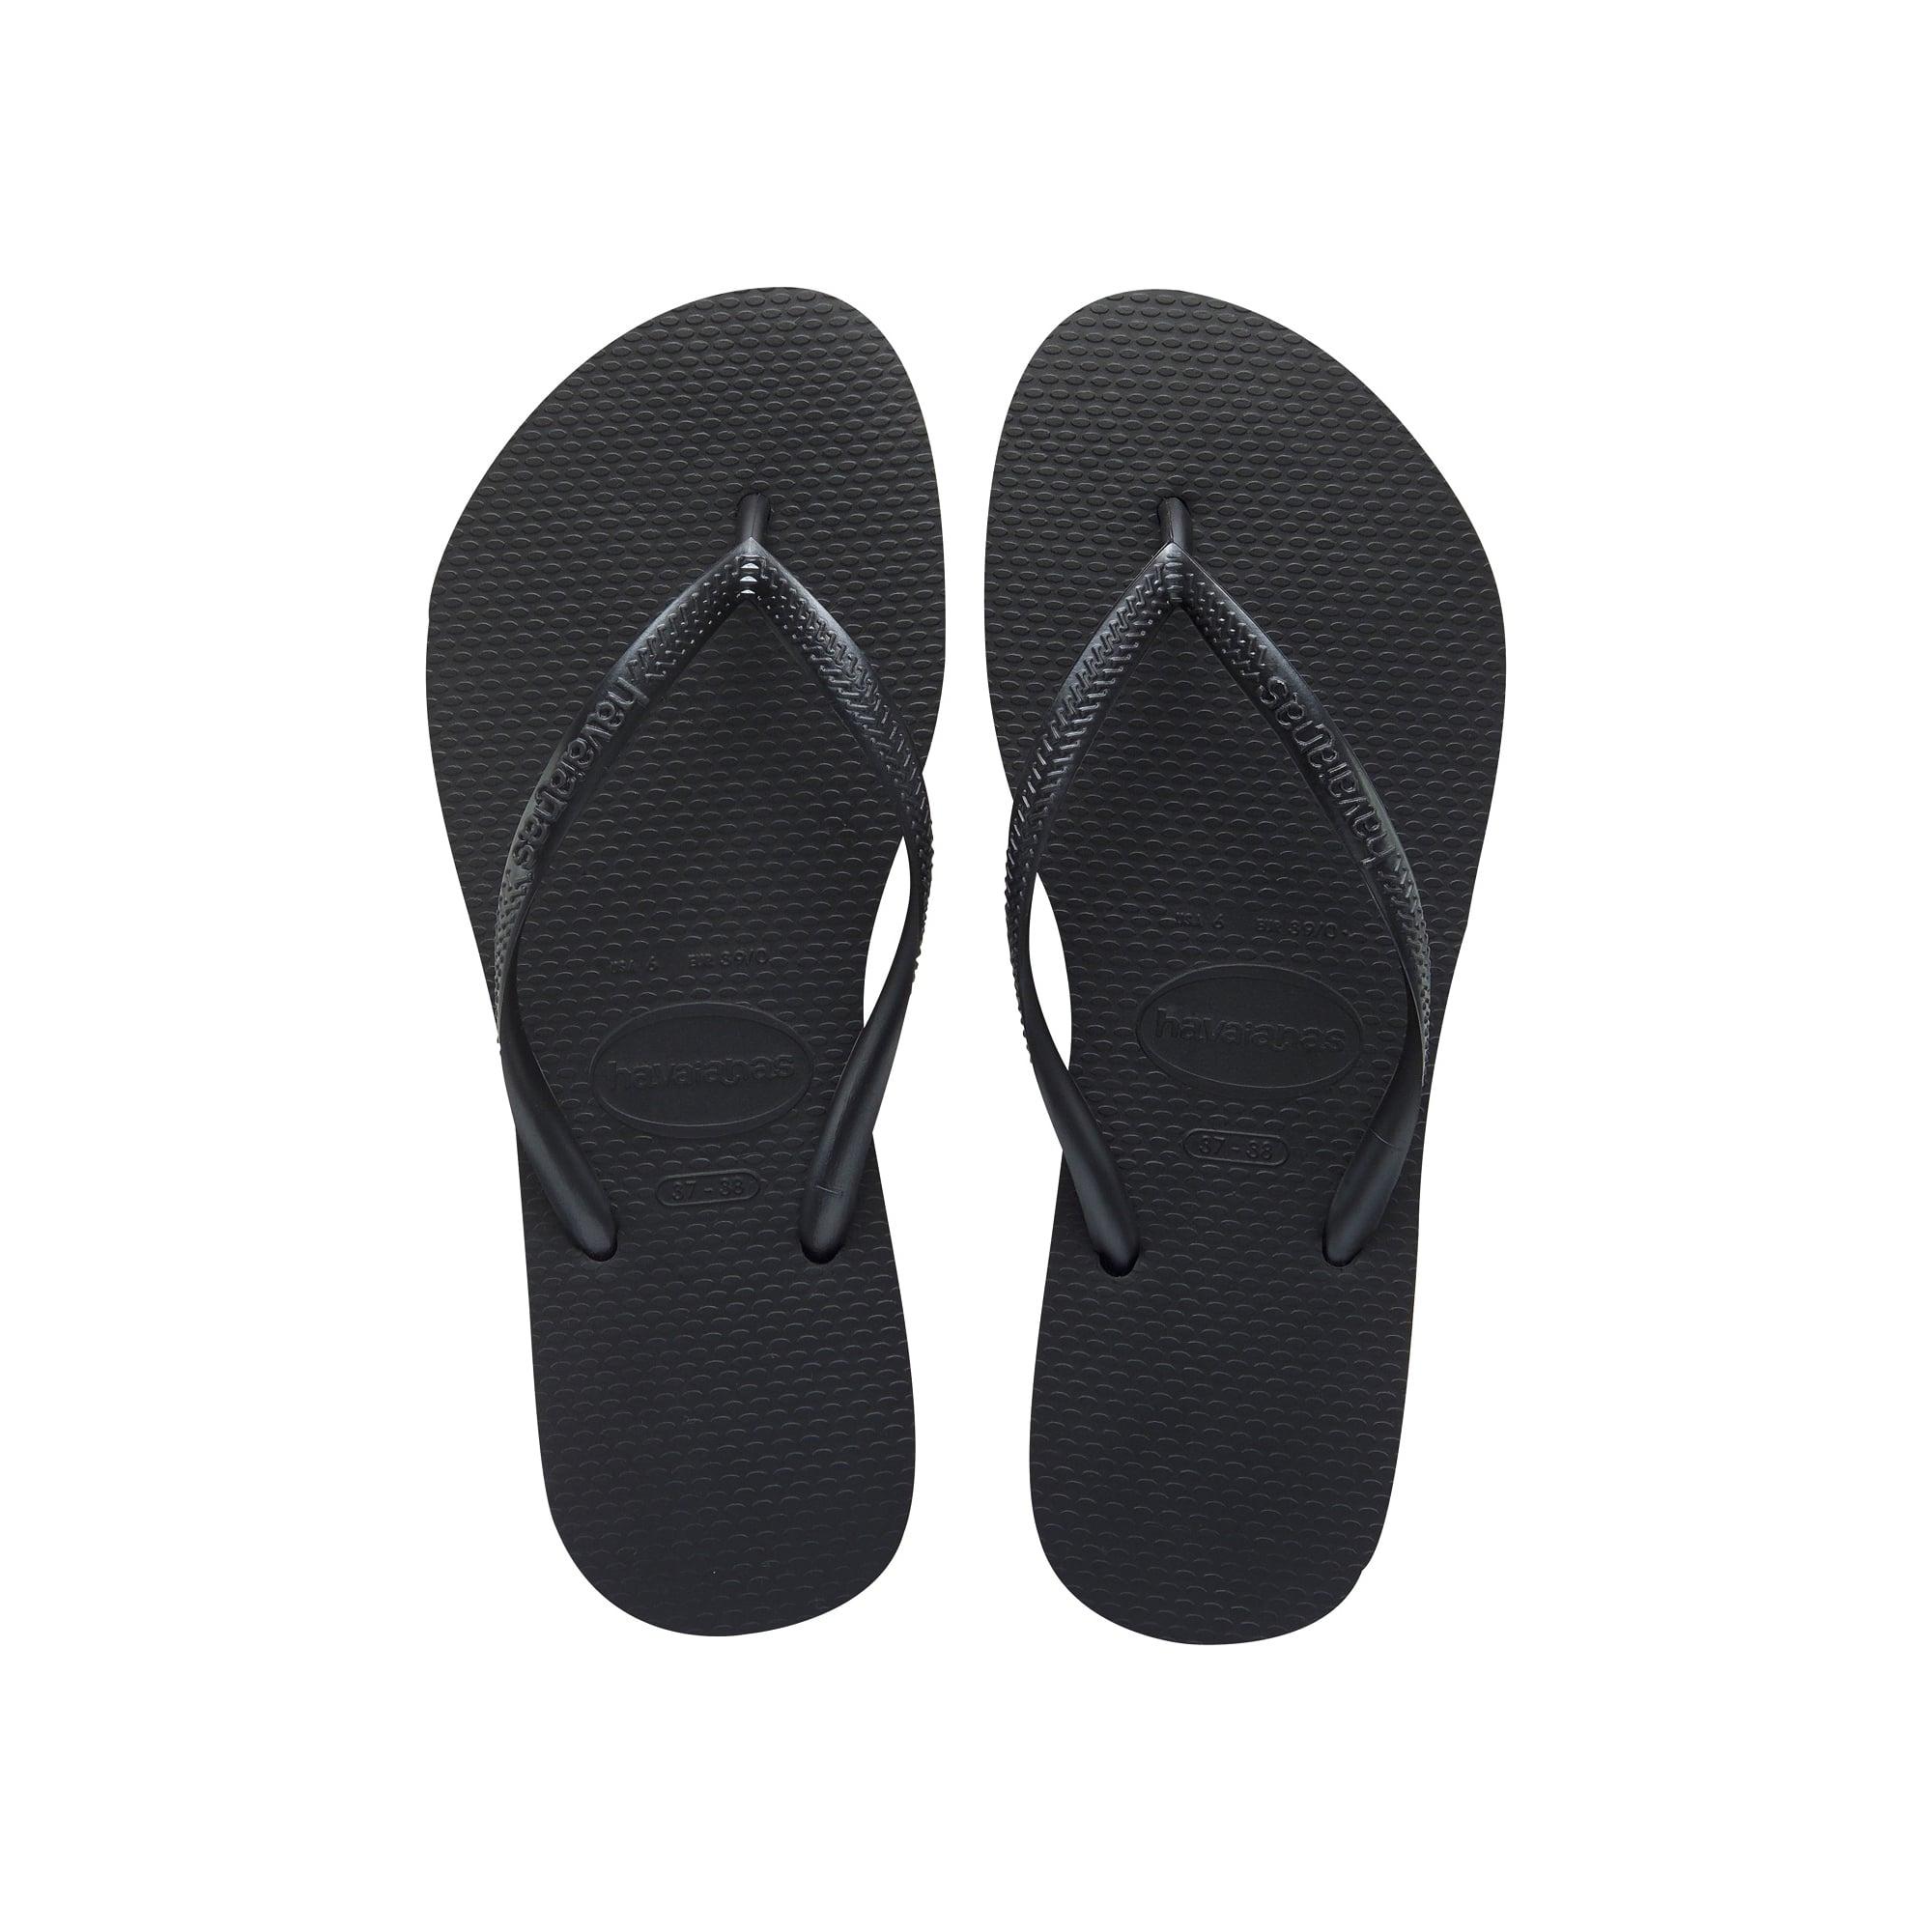 HAVAIANAS Slim Flip Flop in Black - Woman from Collen   Clare UK 8ff45ca45